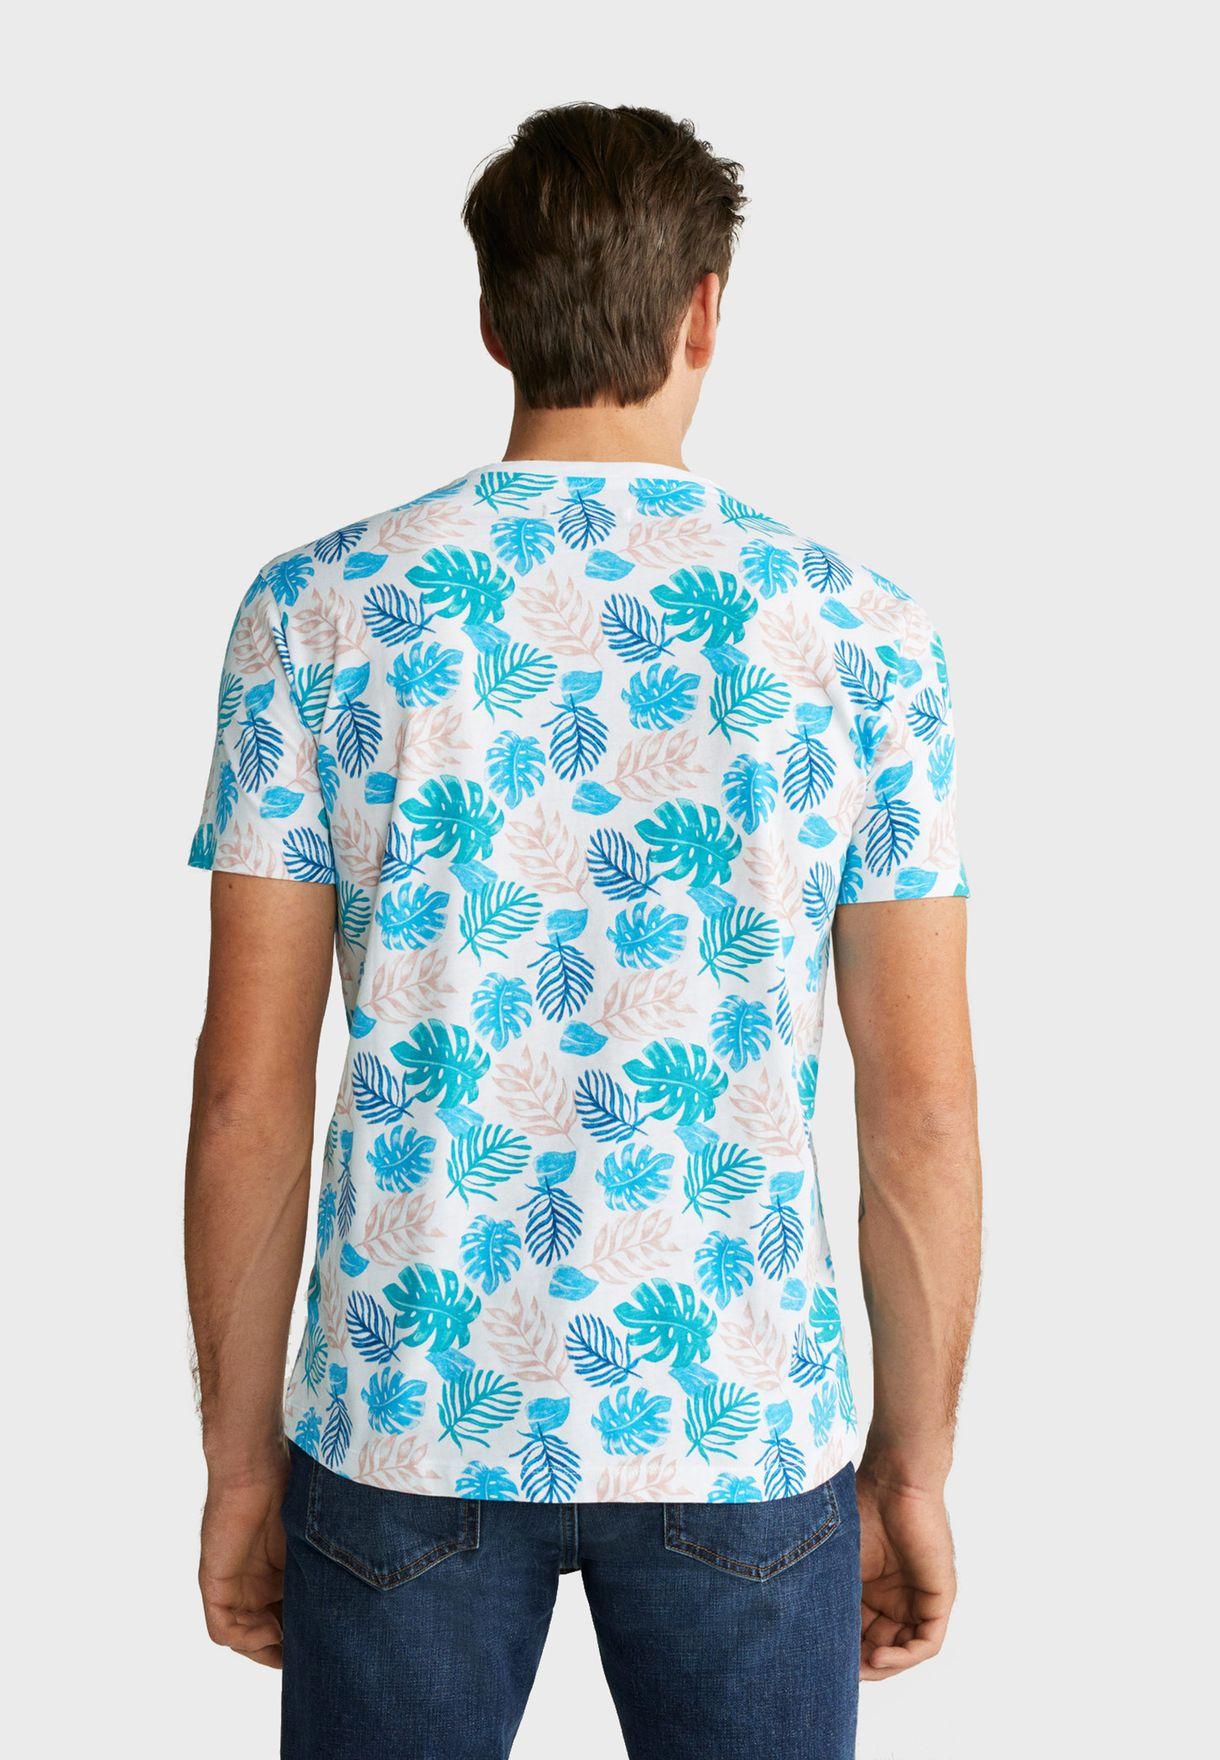 Leaves Print Crew Neck T-Shirt